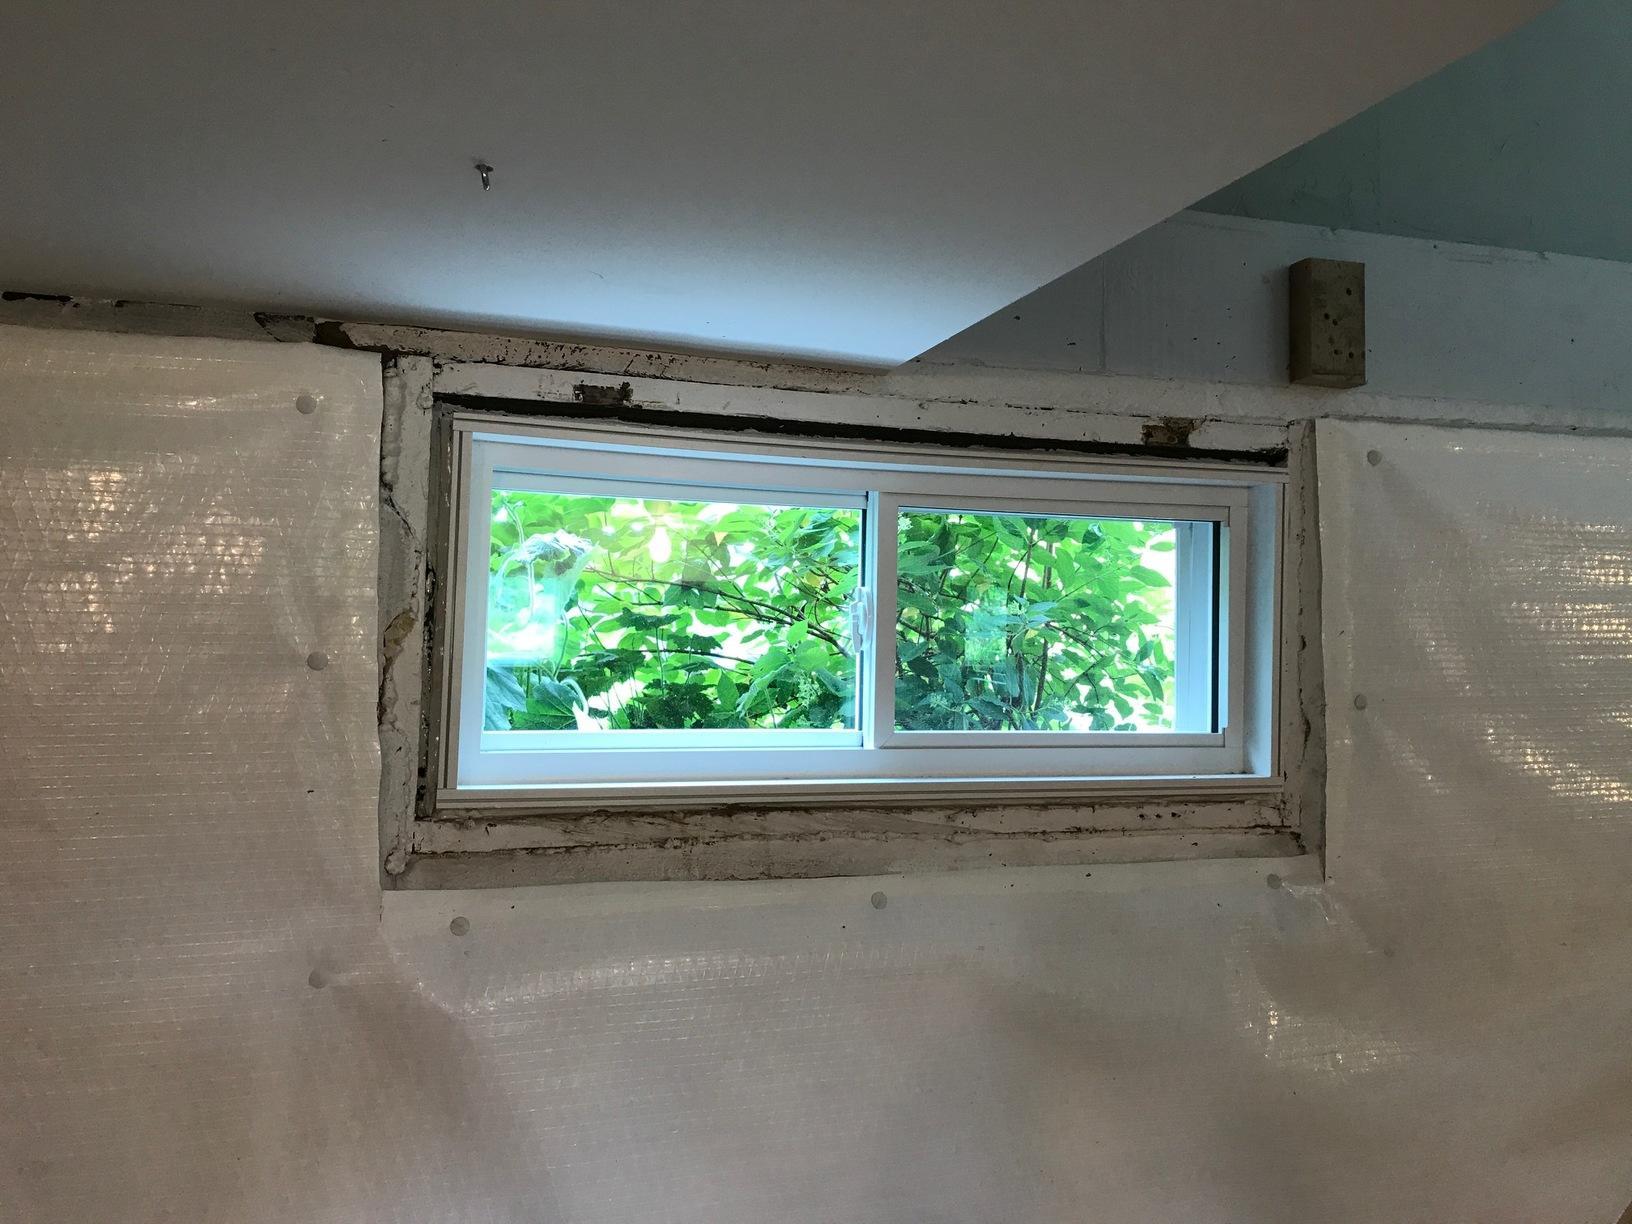 New Everlast Sliding Window